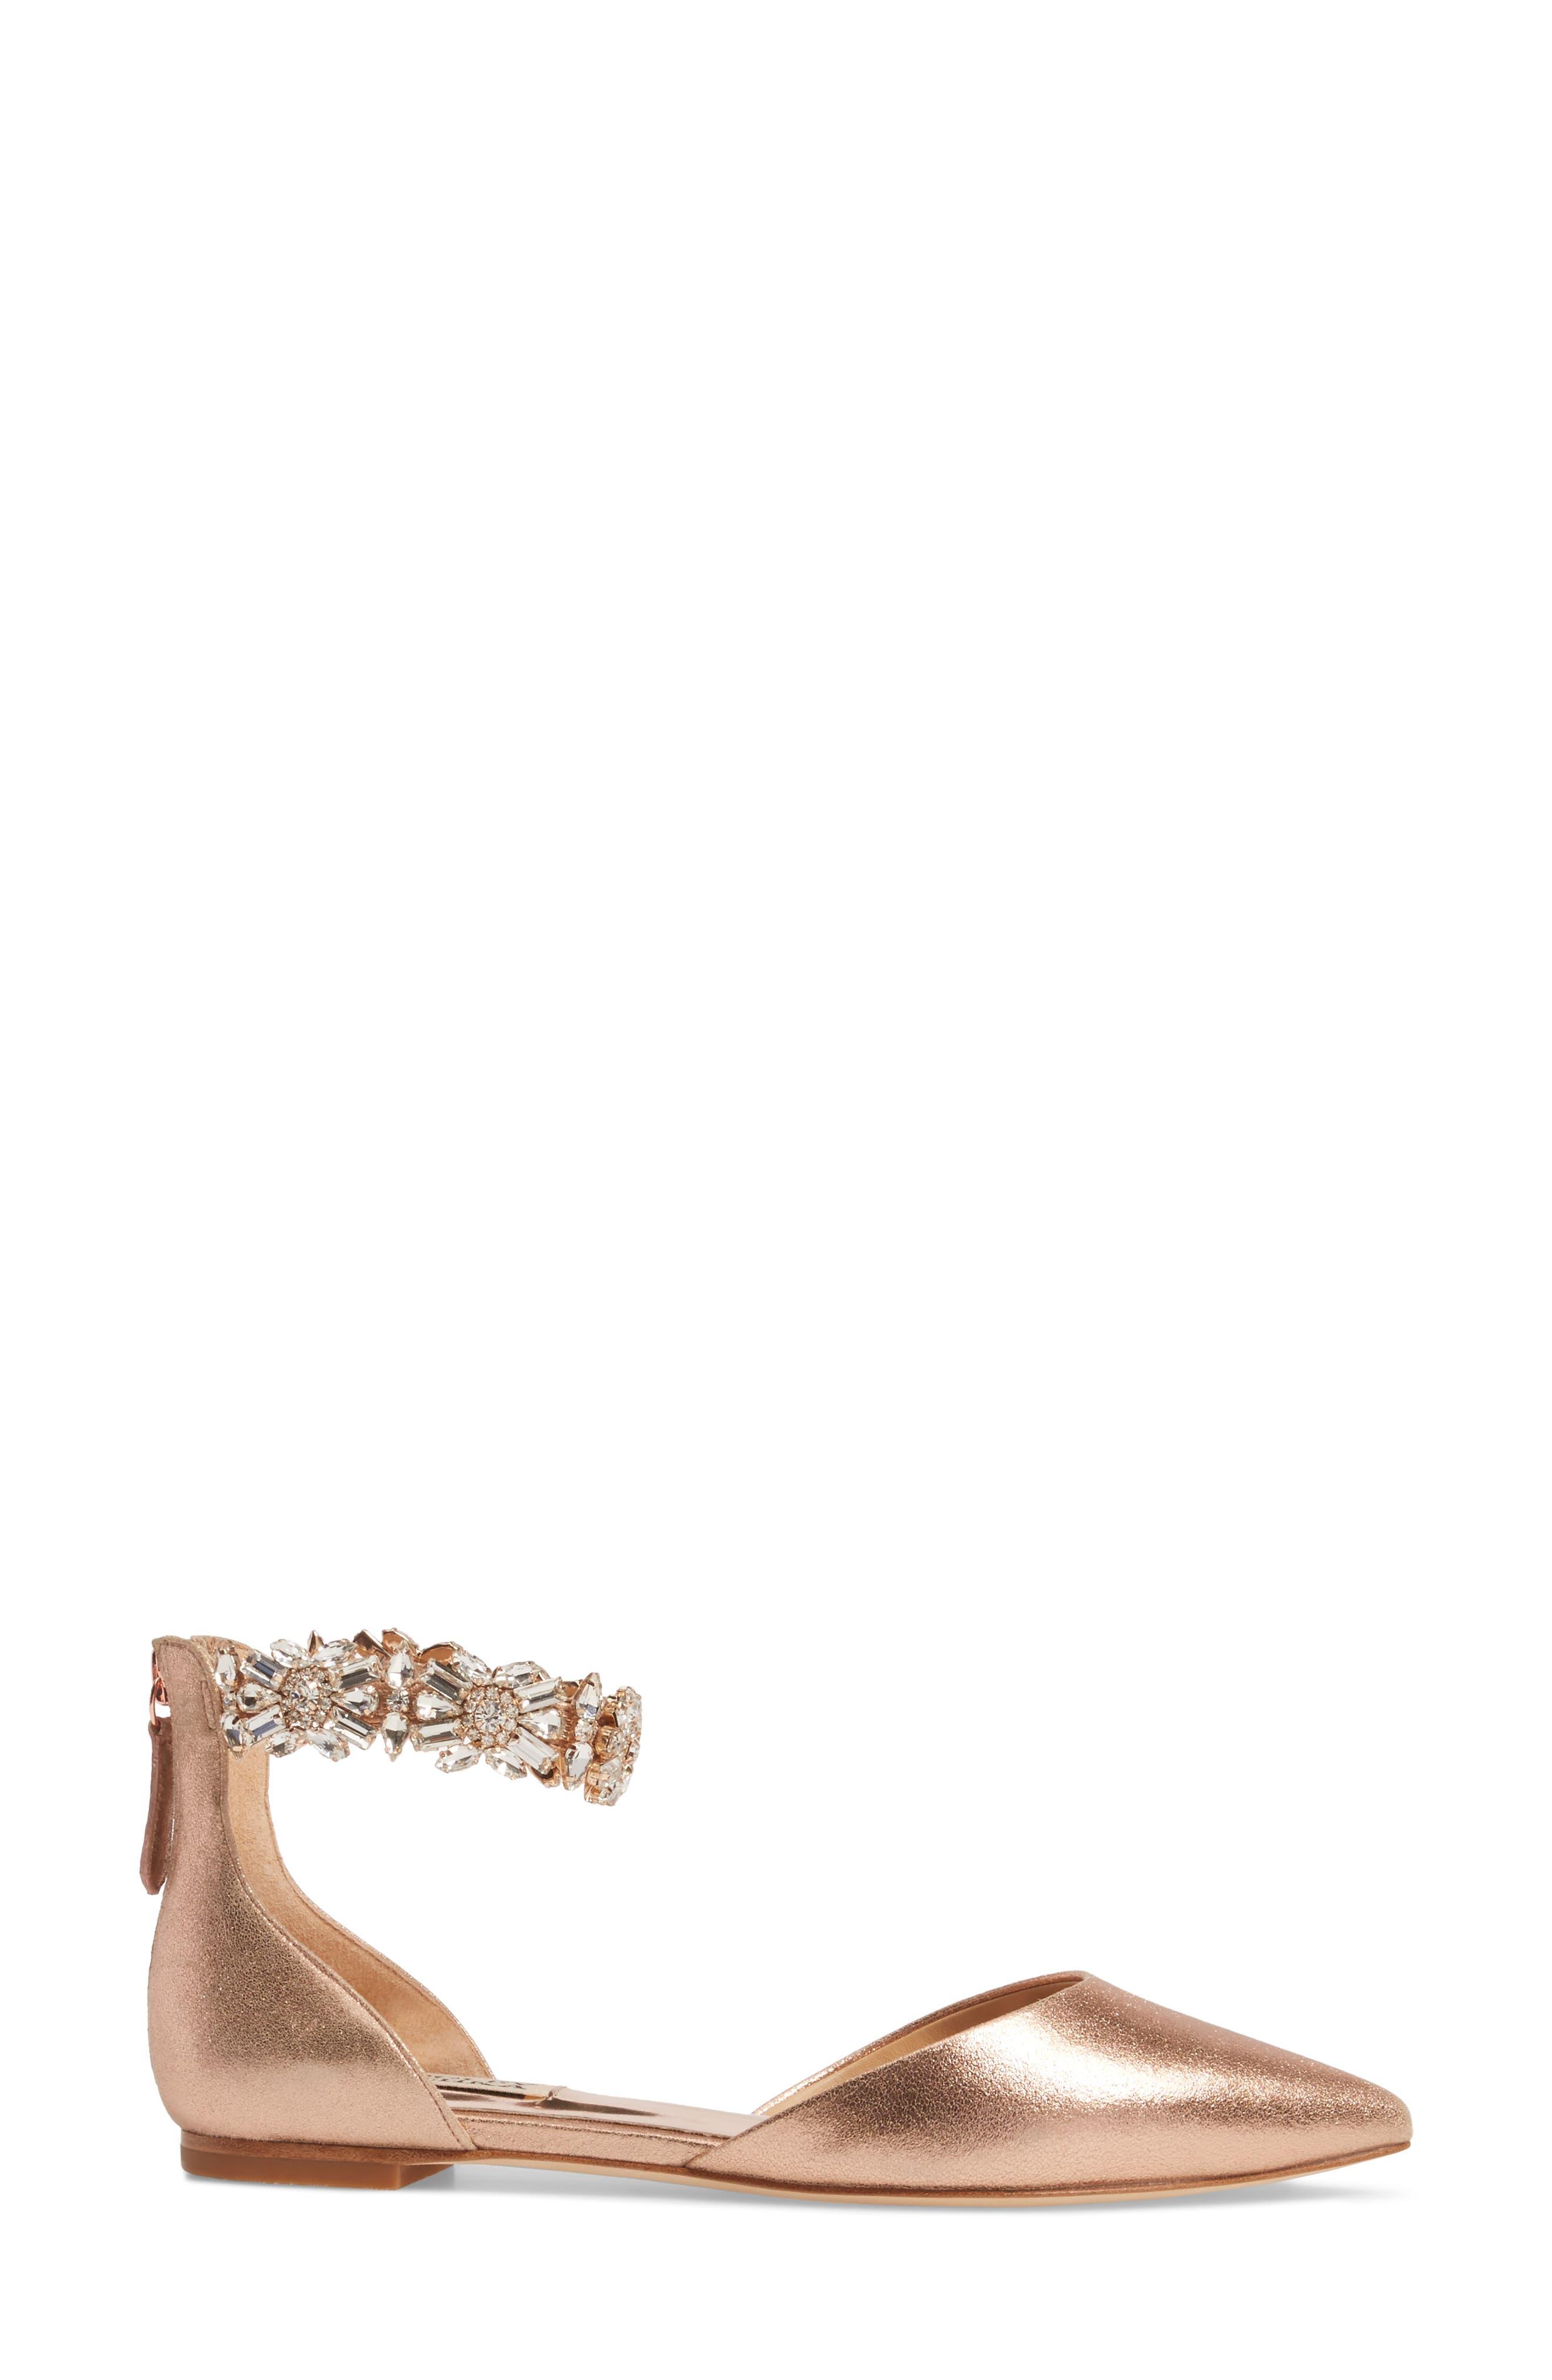 Alternate Image 3  - Badgley Mischka Morgen Ankle Strap Flat (Women)